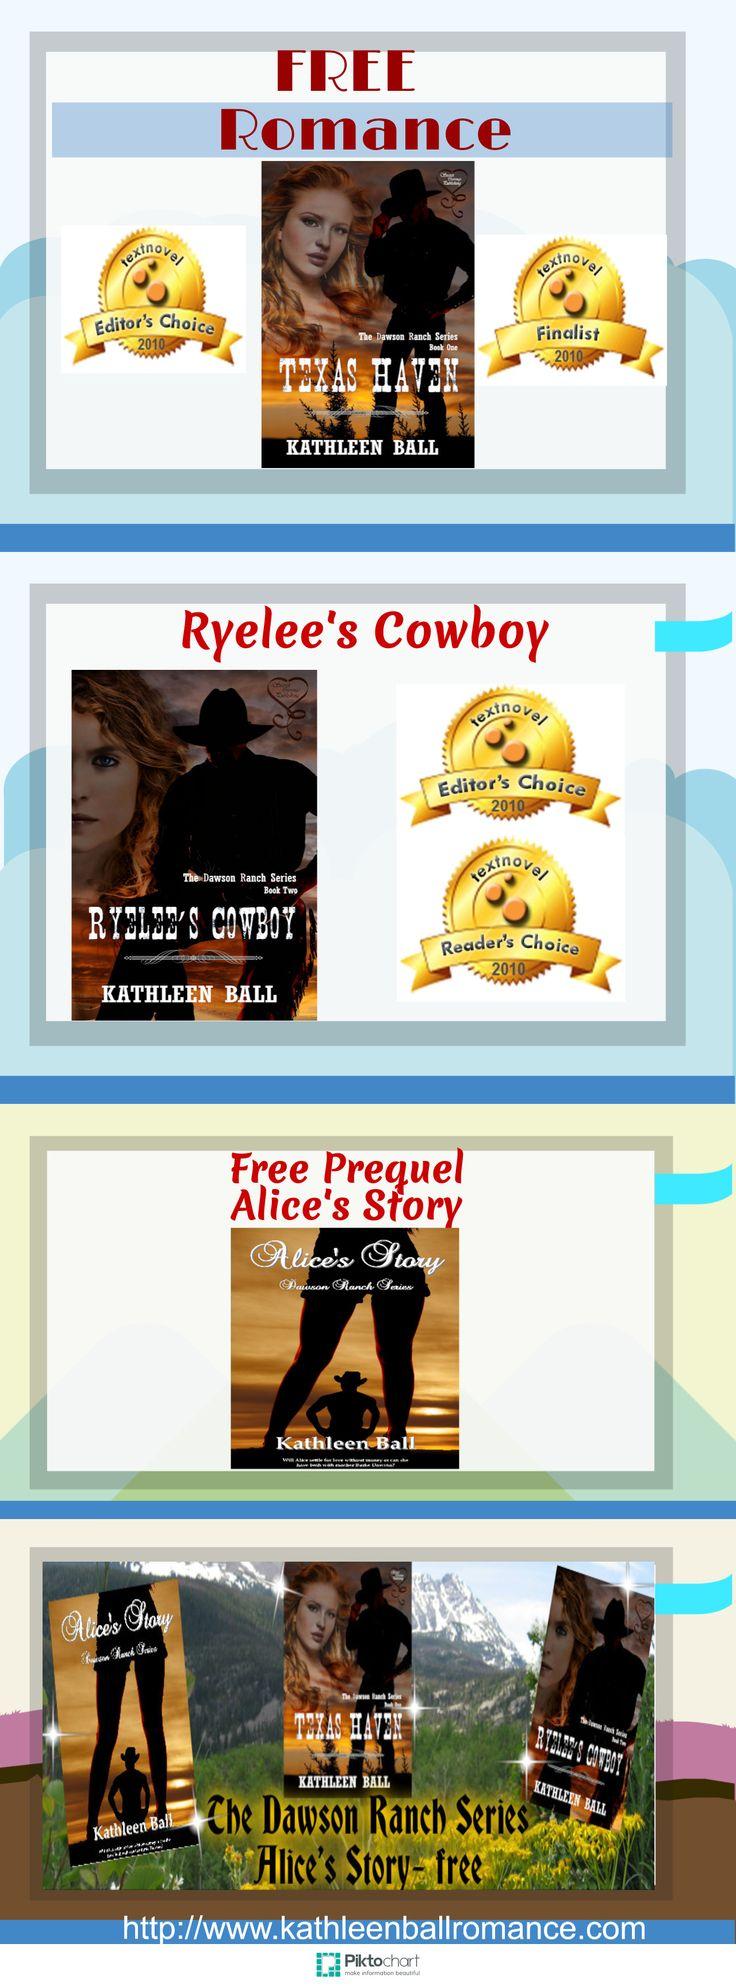 Online dating romance novels